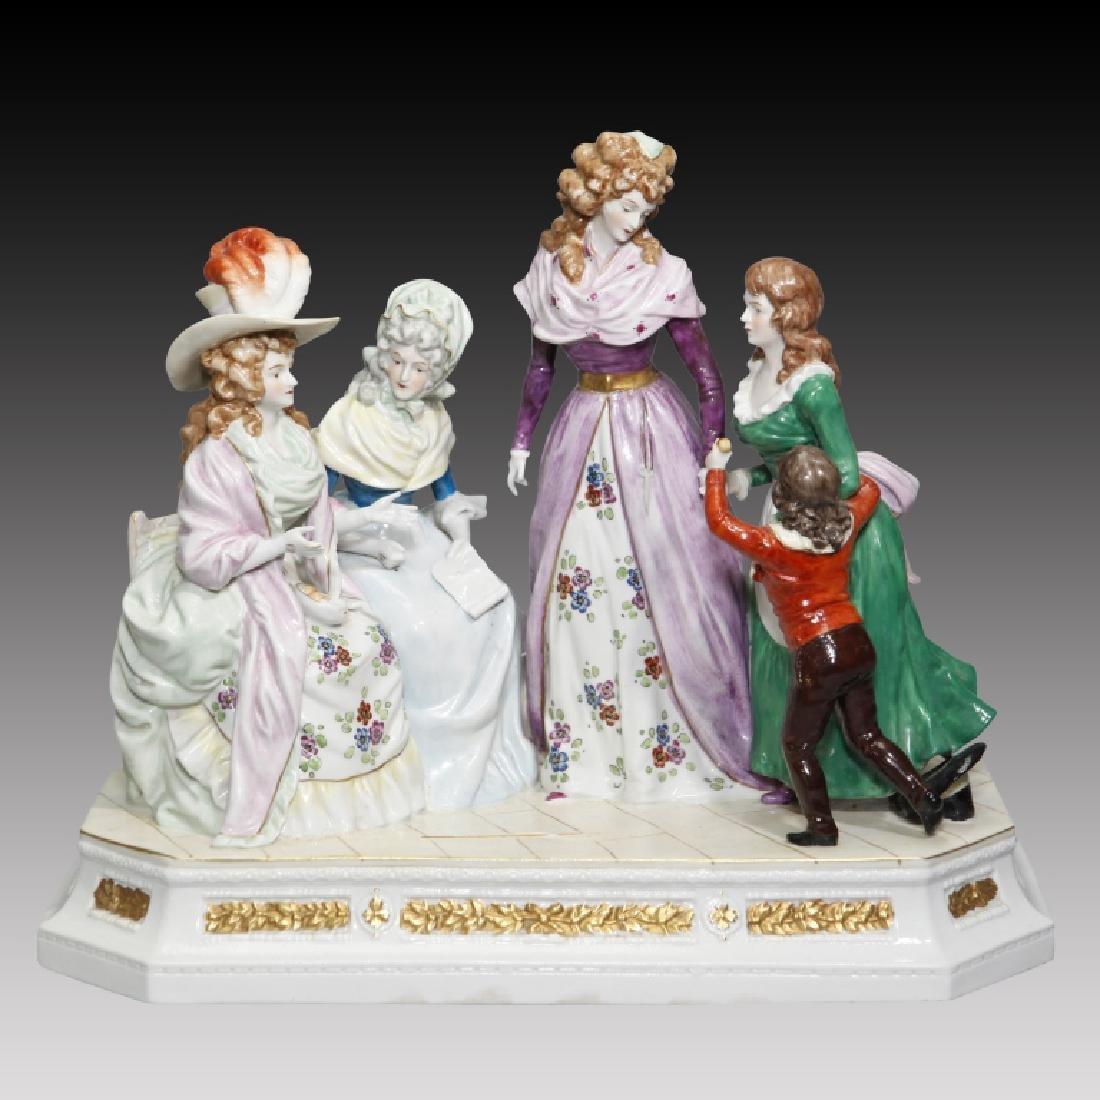 Figurine Grouping of 3 Women and Children